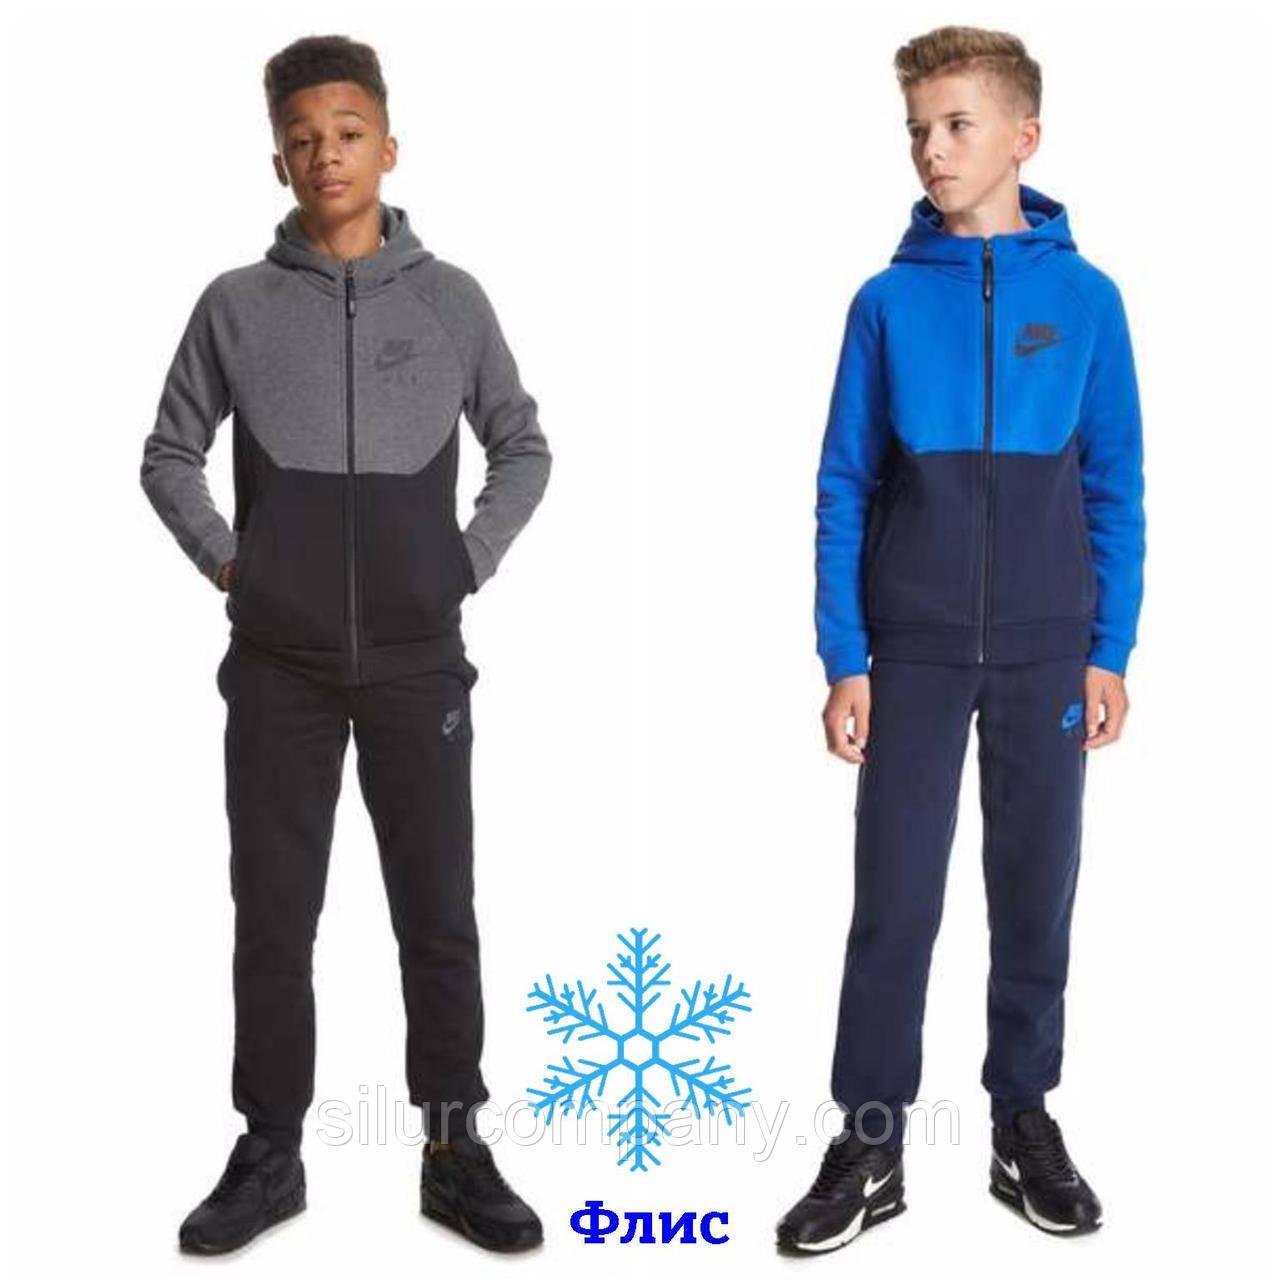 d003bb41070 Теплый спортивный костюм Nike для подростка с начесом  продажа